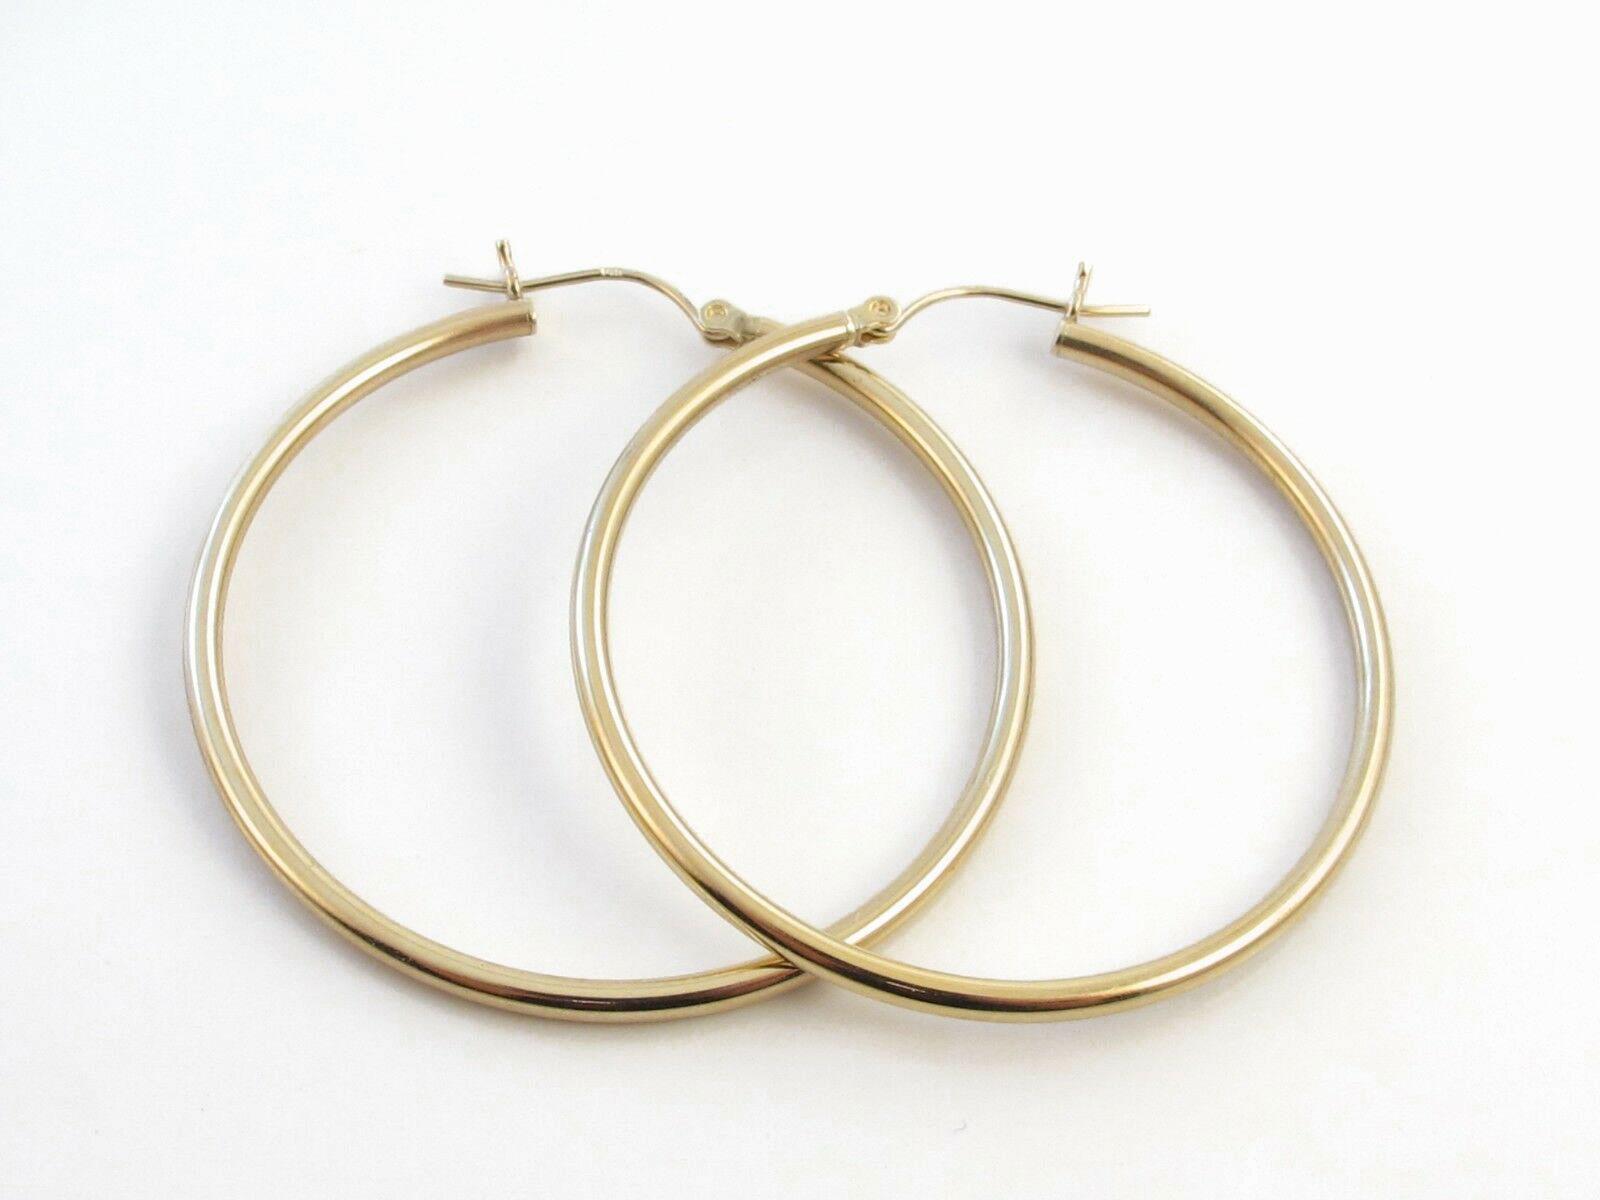 14k Yellow Gold Shiny Hoop Earrings